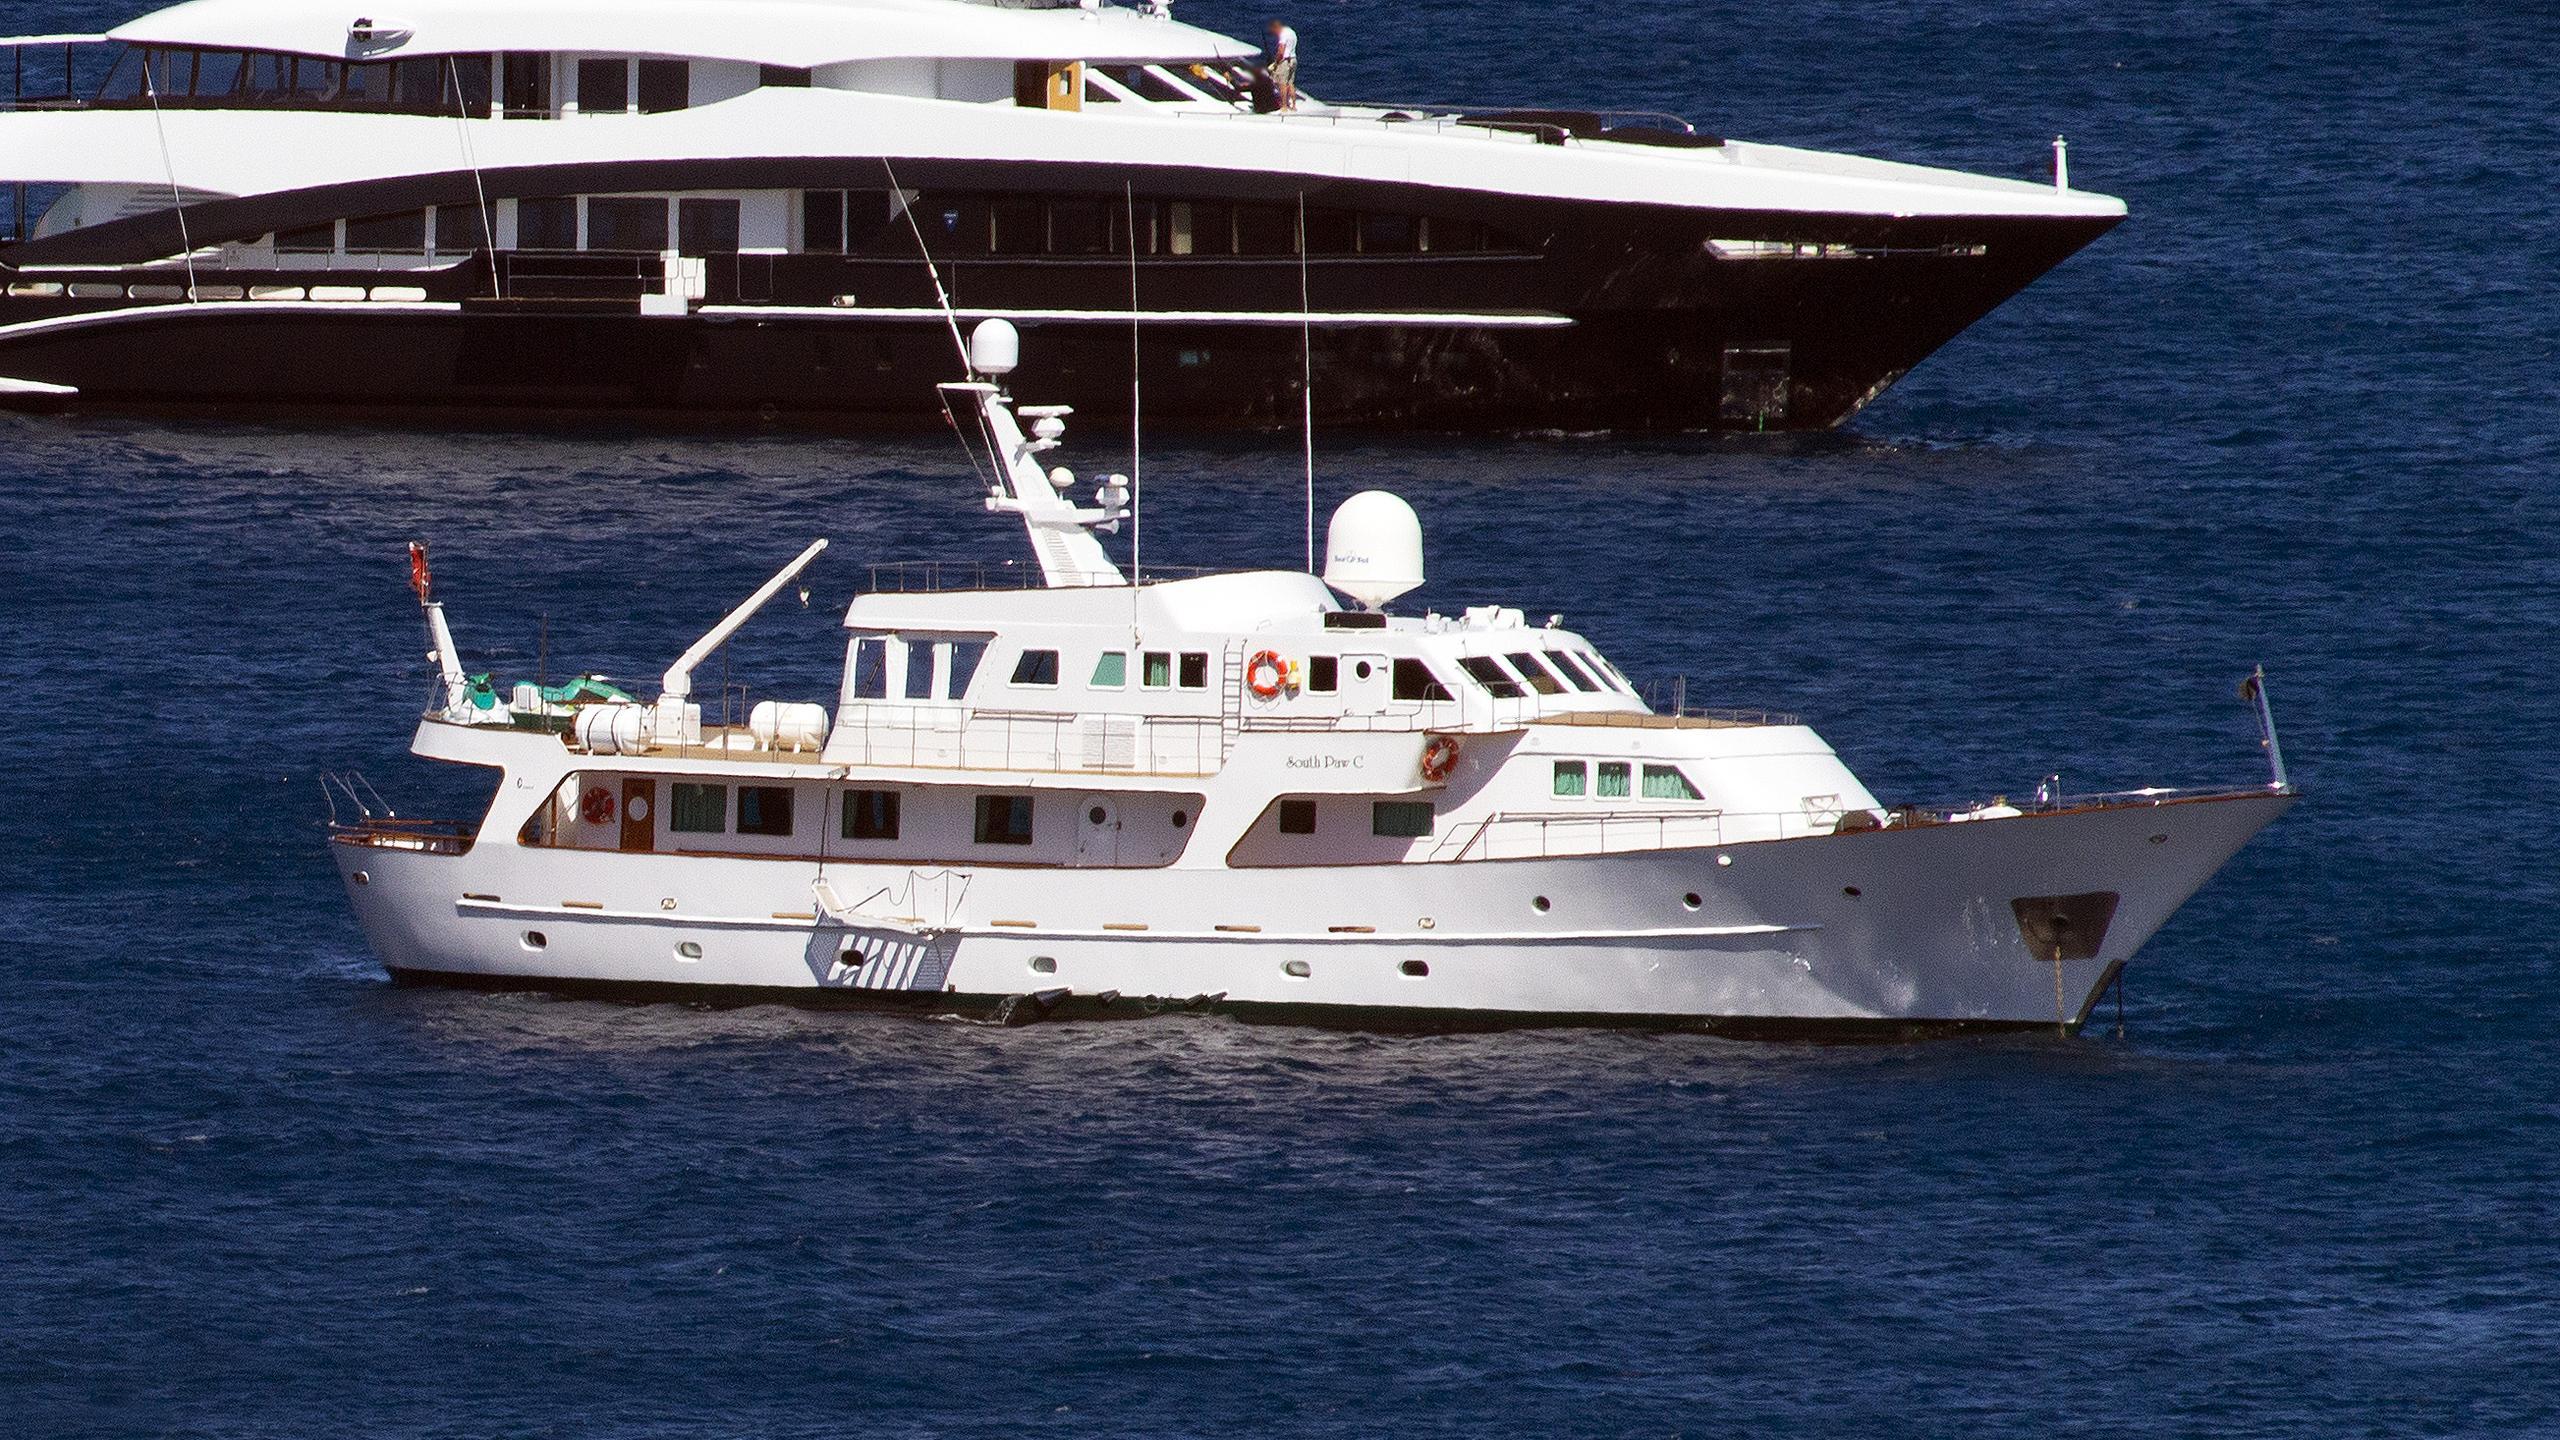 south-paw-c-motor-yacht-codecasa-1977-34m-profile